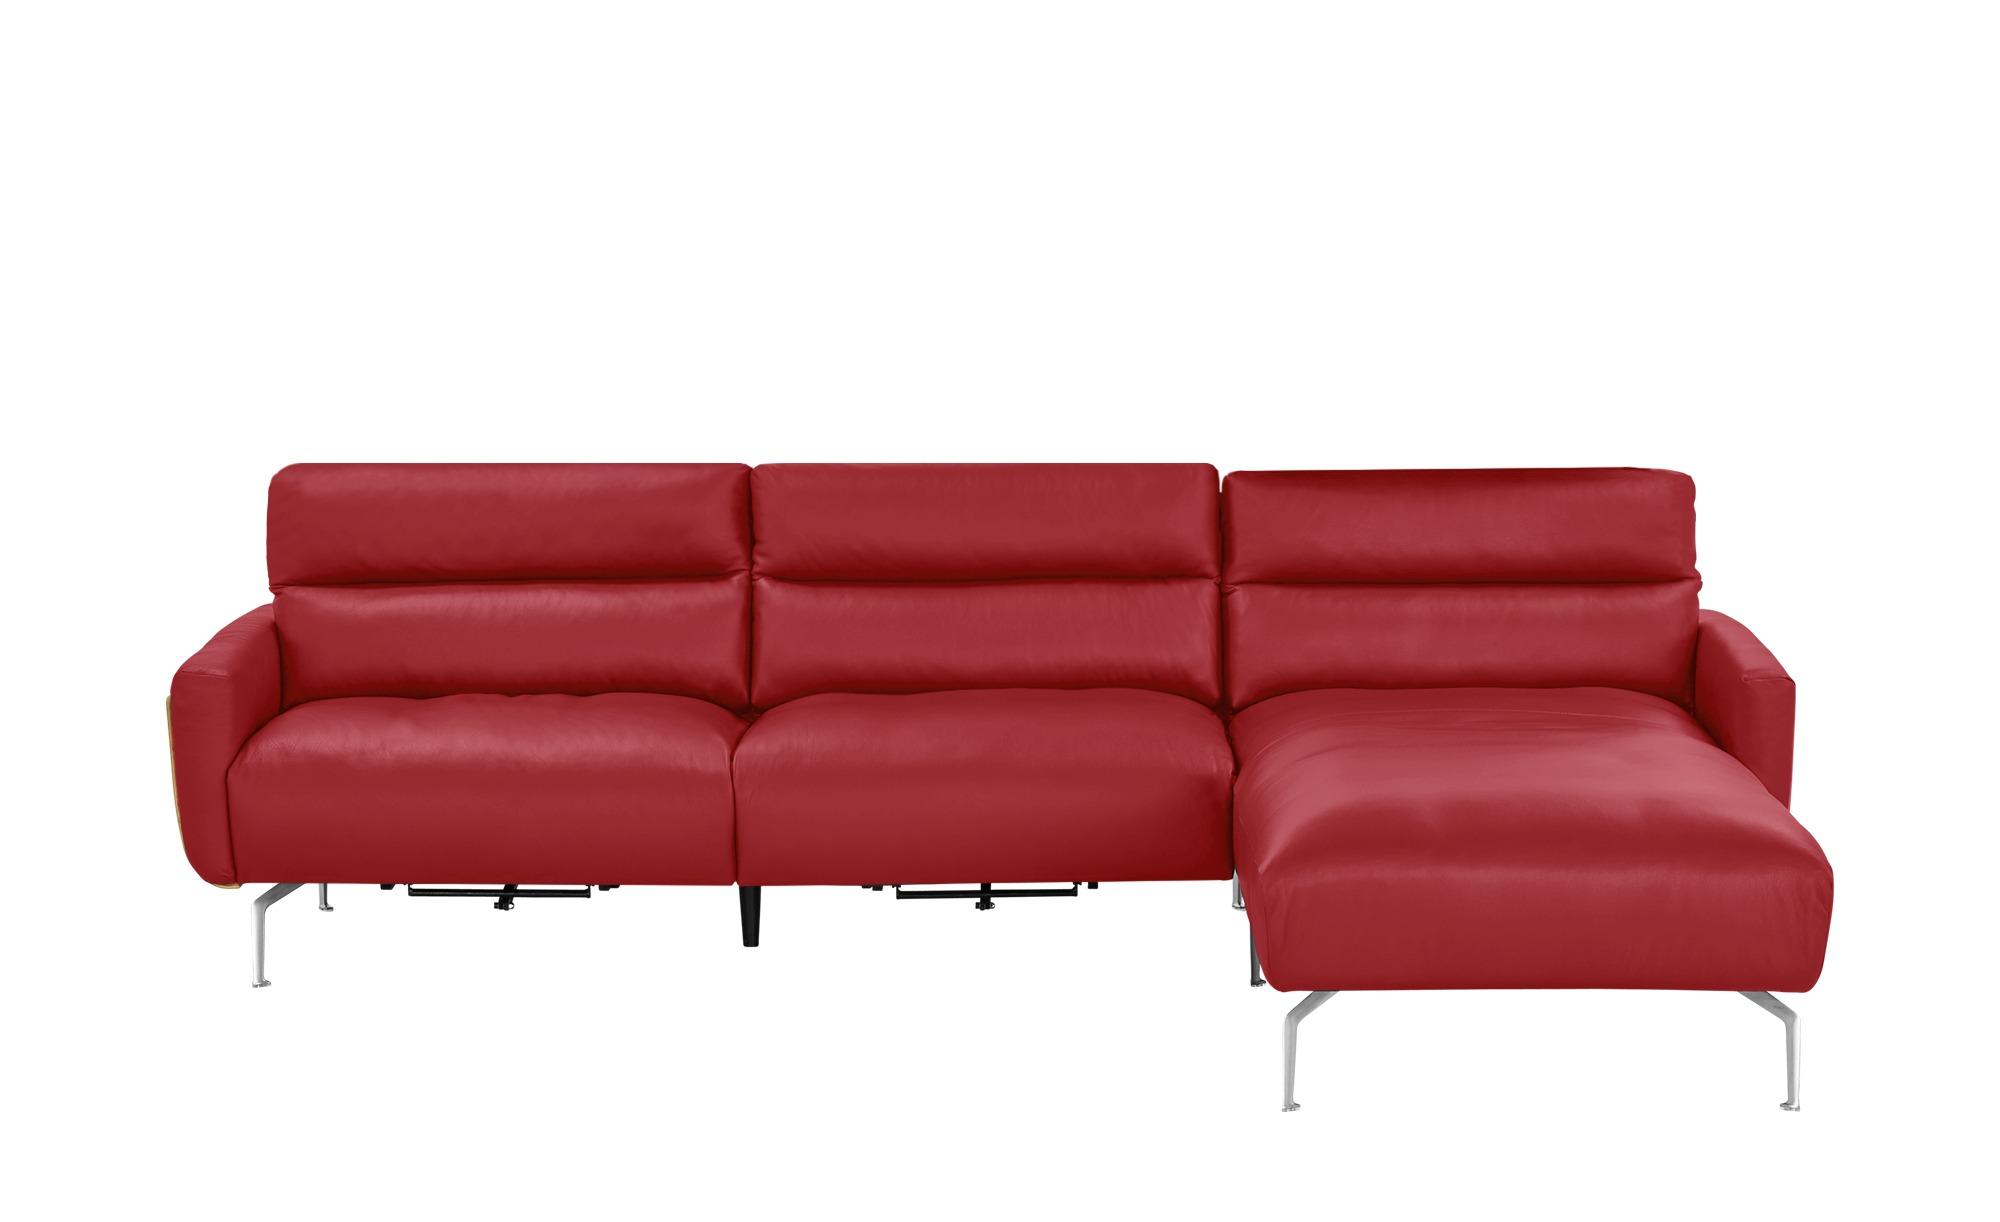 Ecksofa rot - Leder Mads ¦ rot ¦ Maße (cm): H: 90 Polstermöbel > Sofas > Ledersofas - Höffner